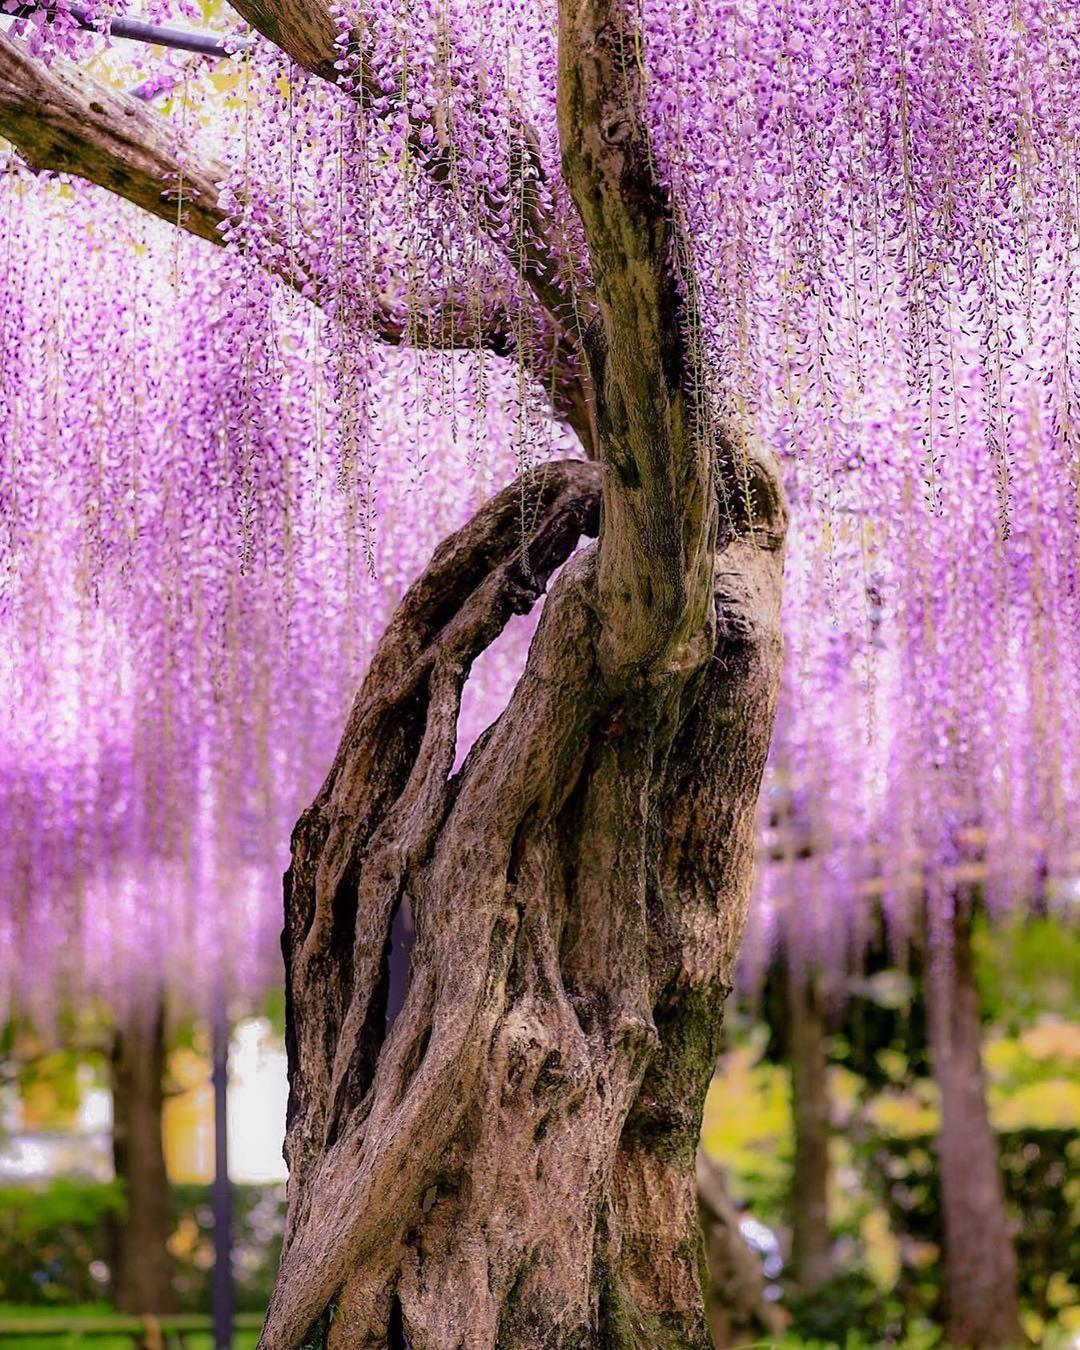 @RETRIP Kyoto: 【RETRIP×京都の藤】 . 今回ご紹介するのは、京都にある「平等院鳳凰堂」です。10円玉でお馴染みの京都の観光名所ですが、毎年4月下旬頃になると藤の花が見頃... - Wacoca